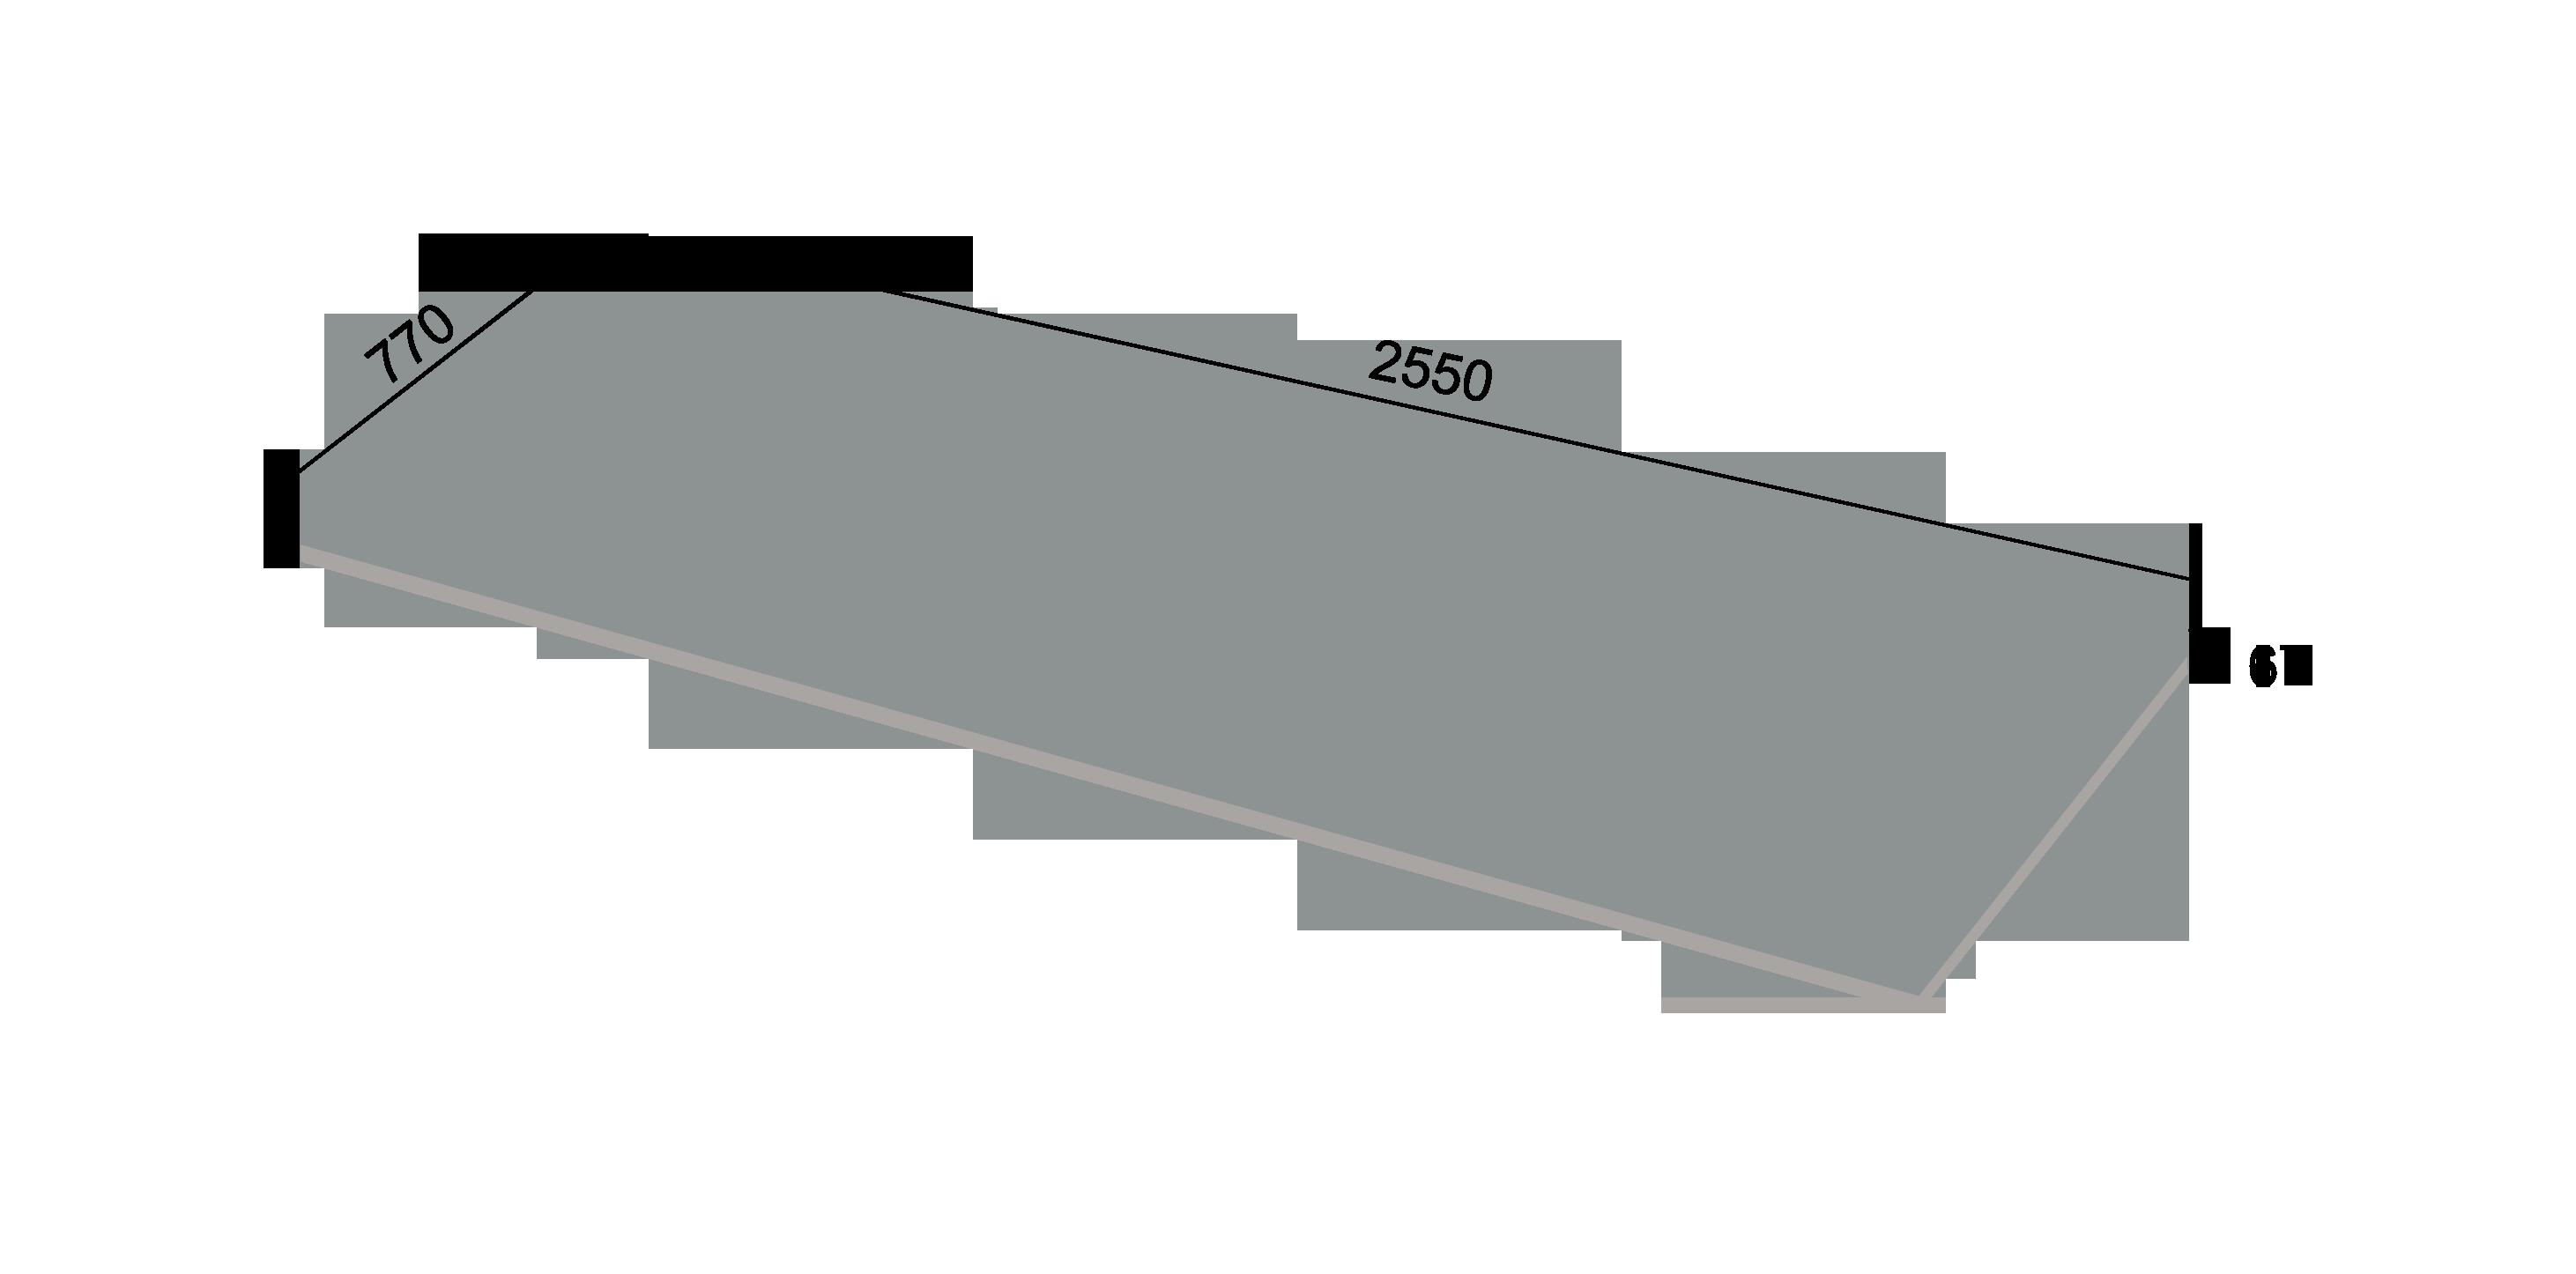 solflex superior plate dimensions